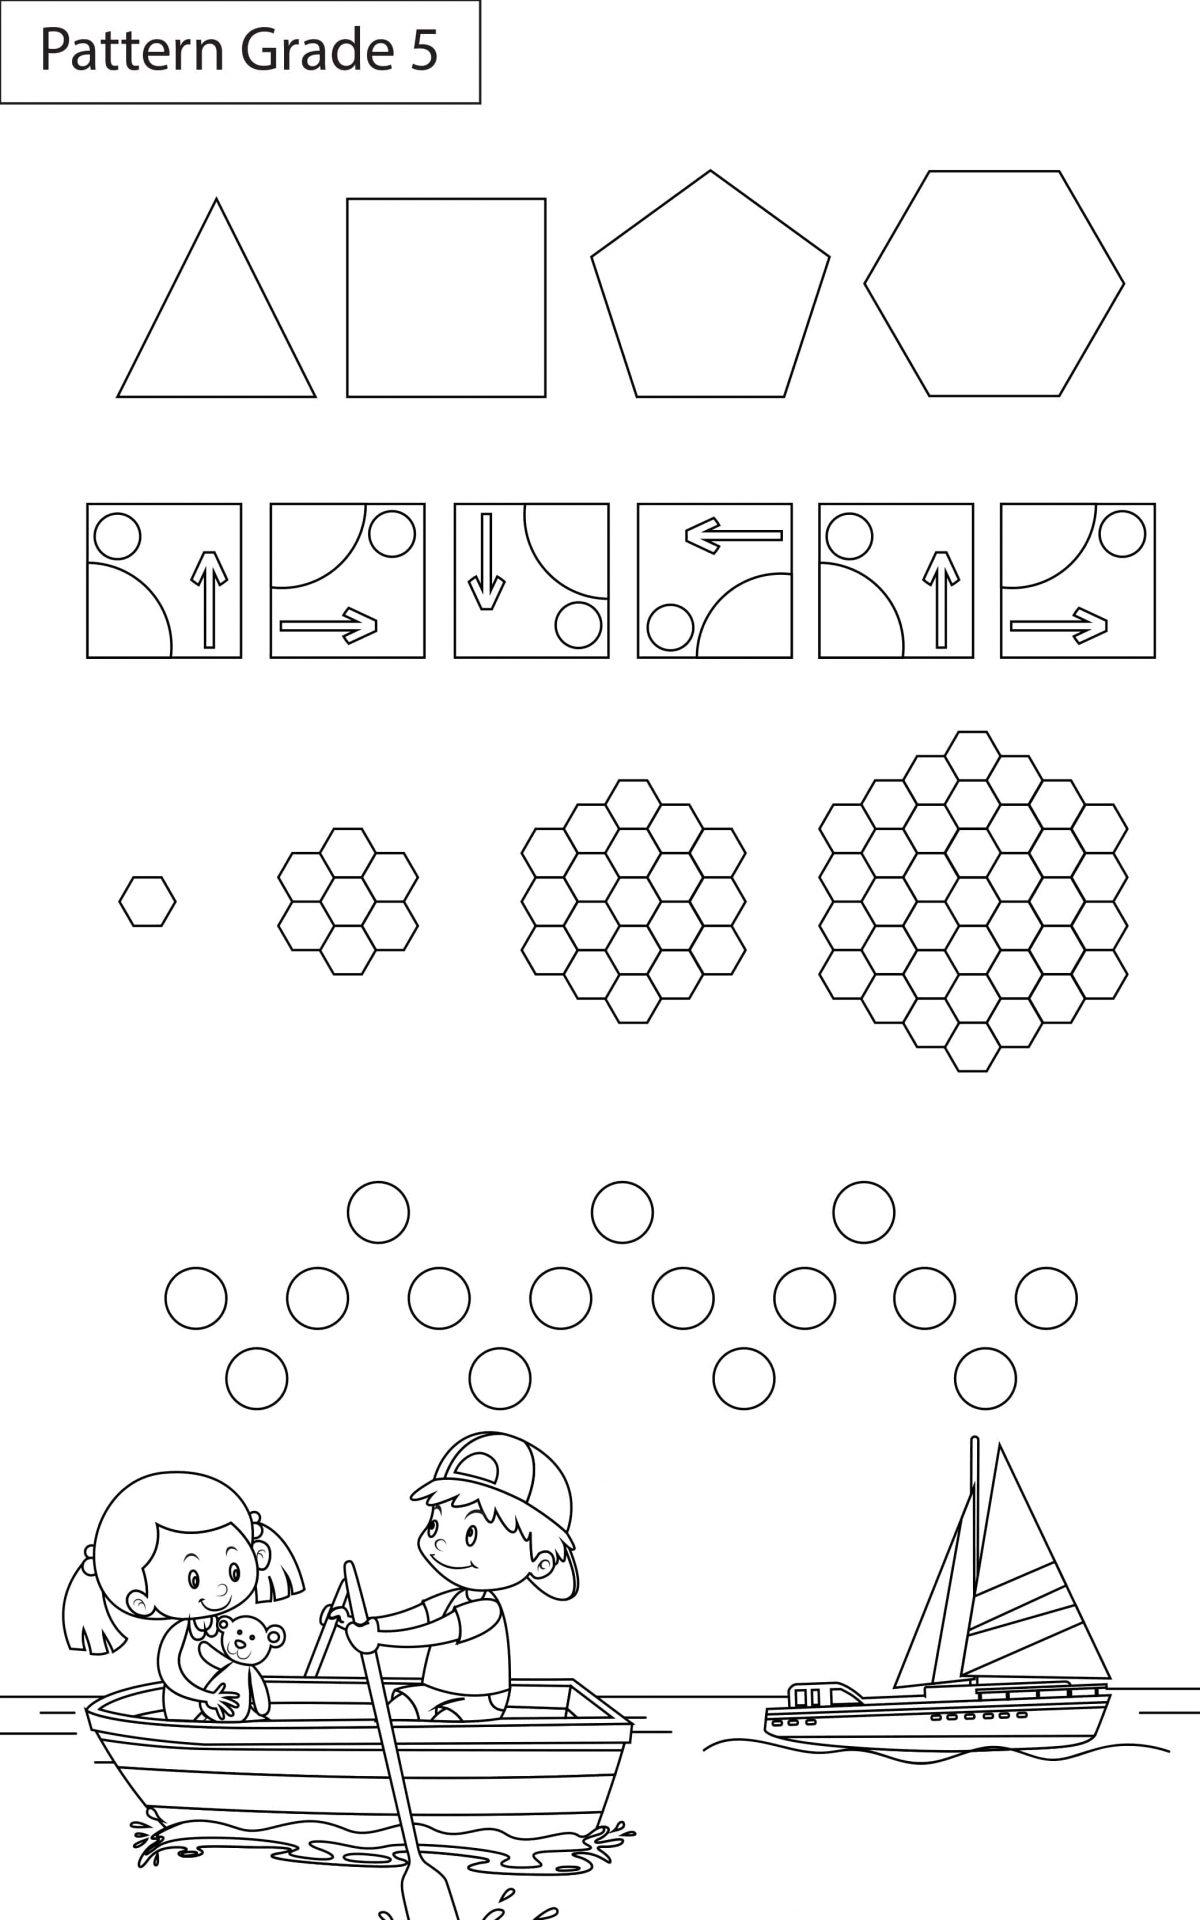 Patterns Worksheets Grade 5 I Maths - key2practice Workbooks